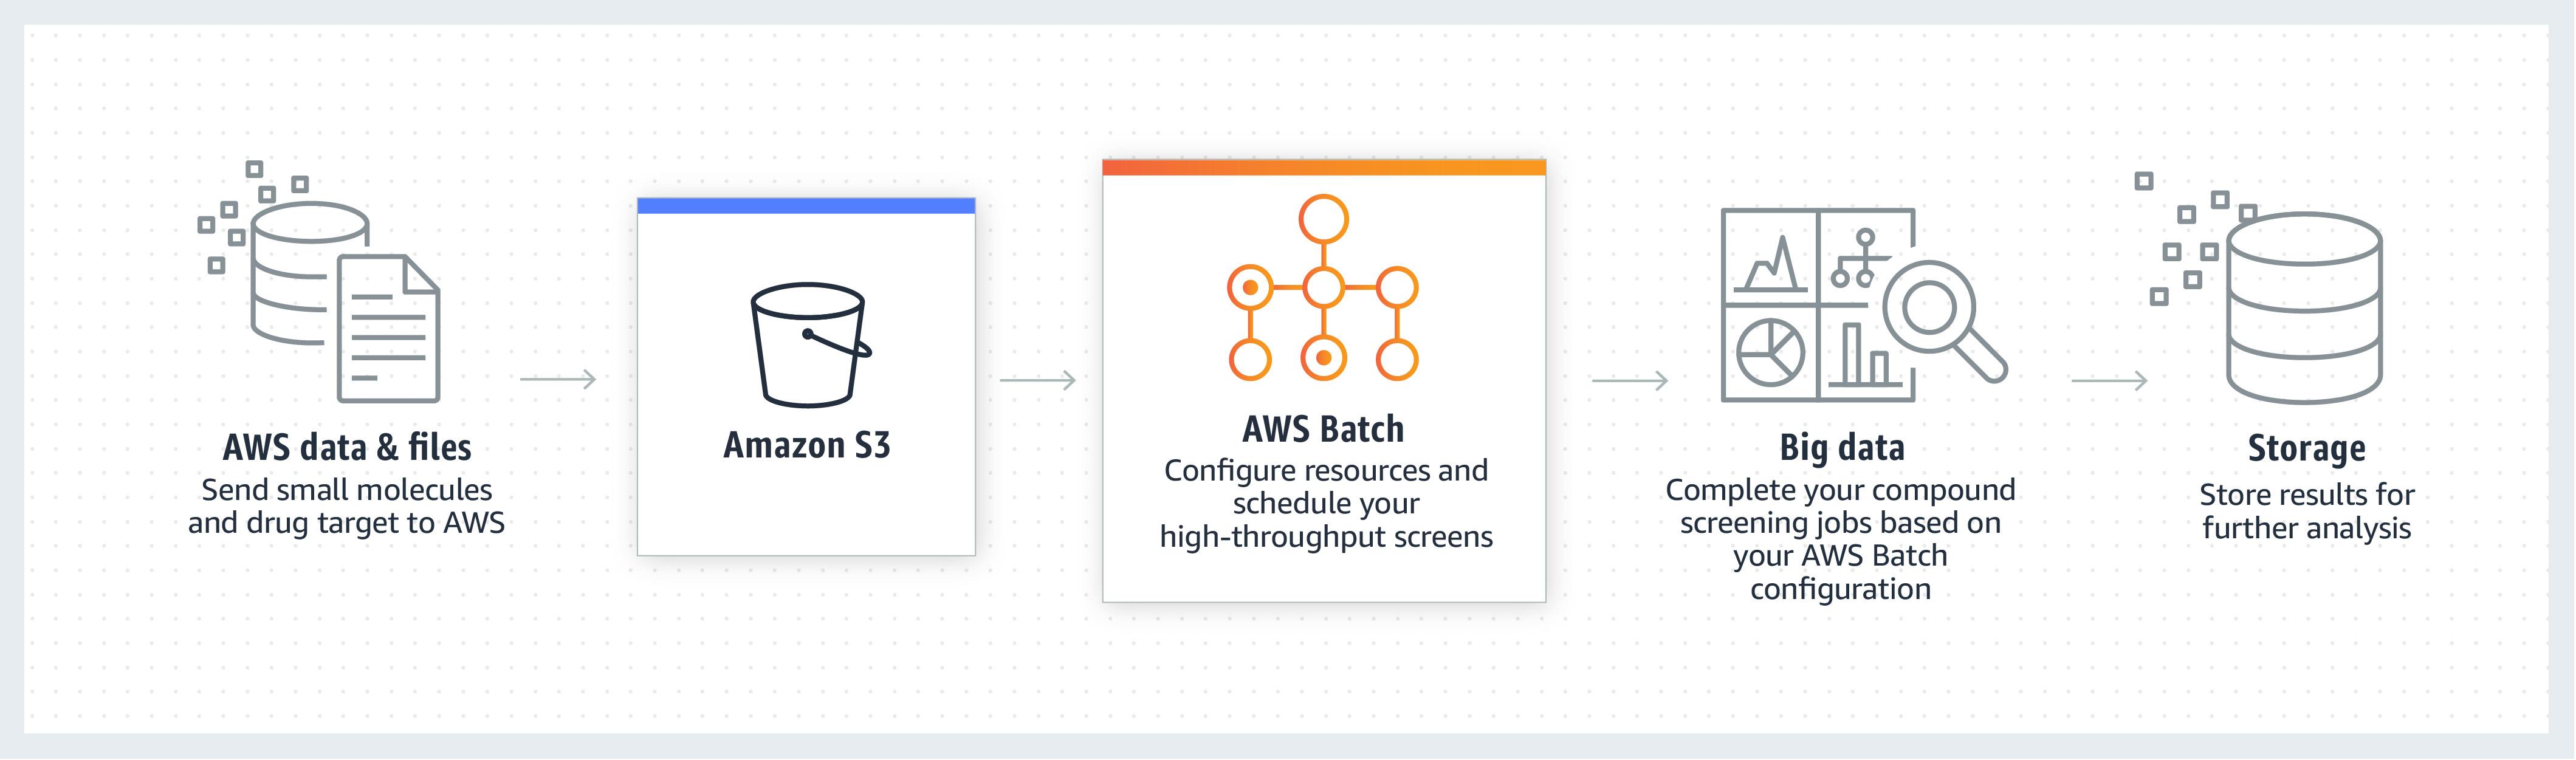 product-page-diagram_AWS-Batch.ai-2